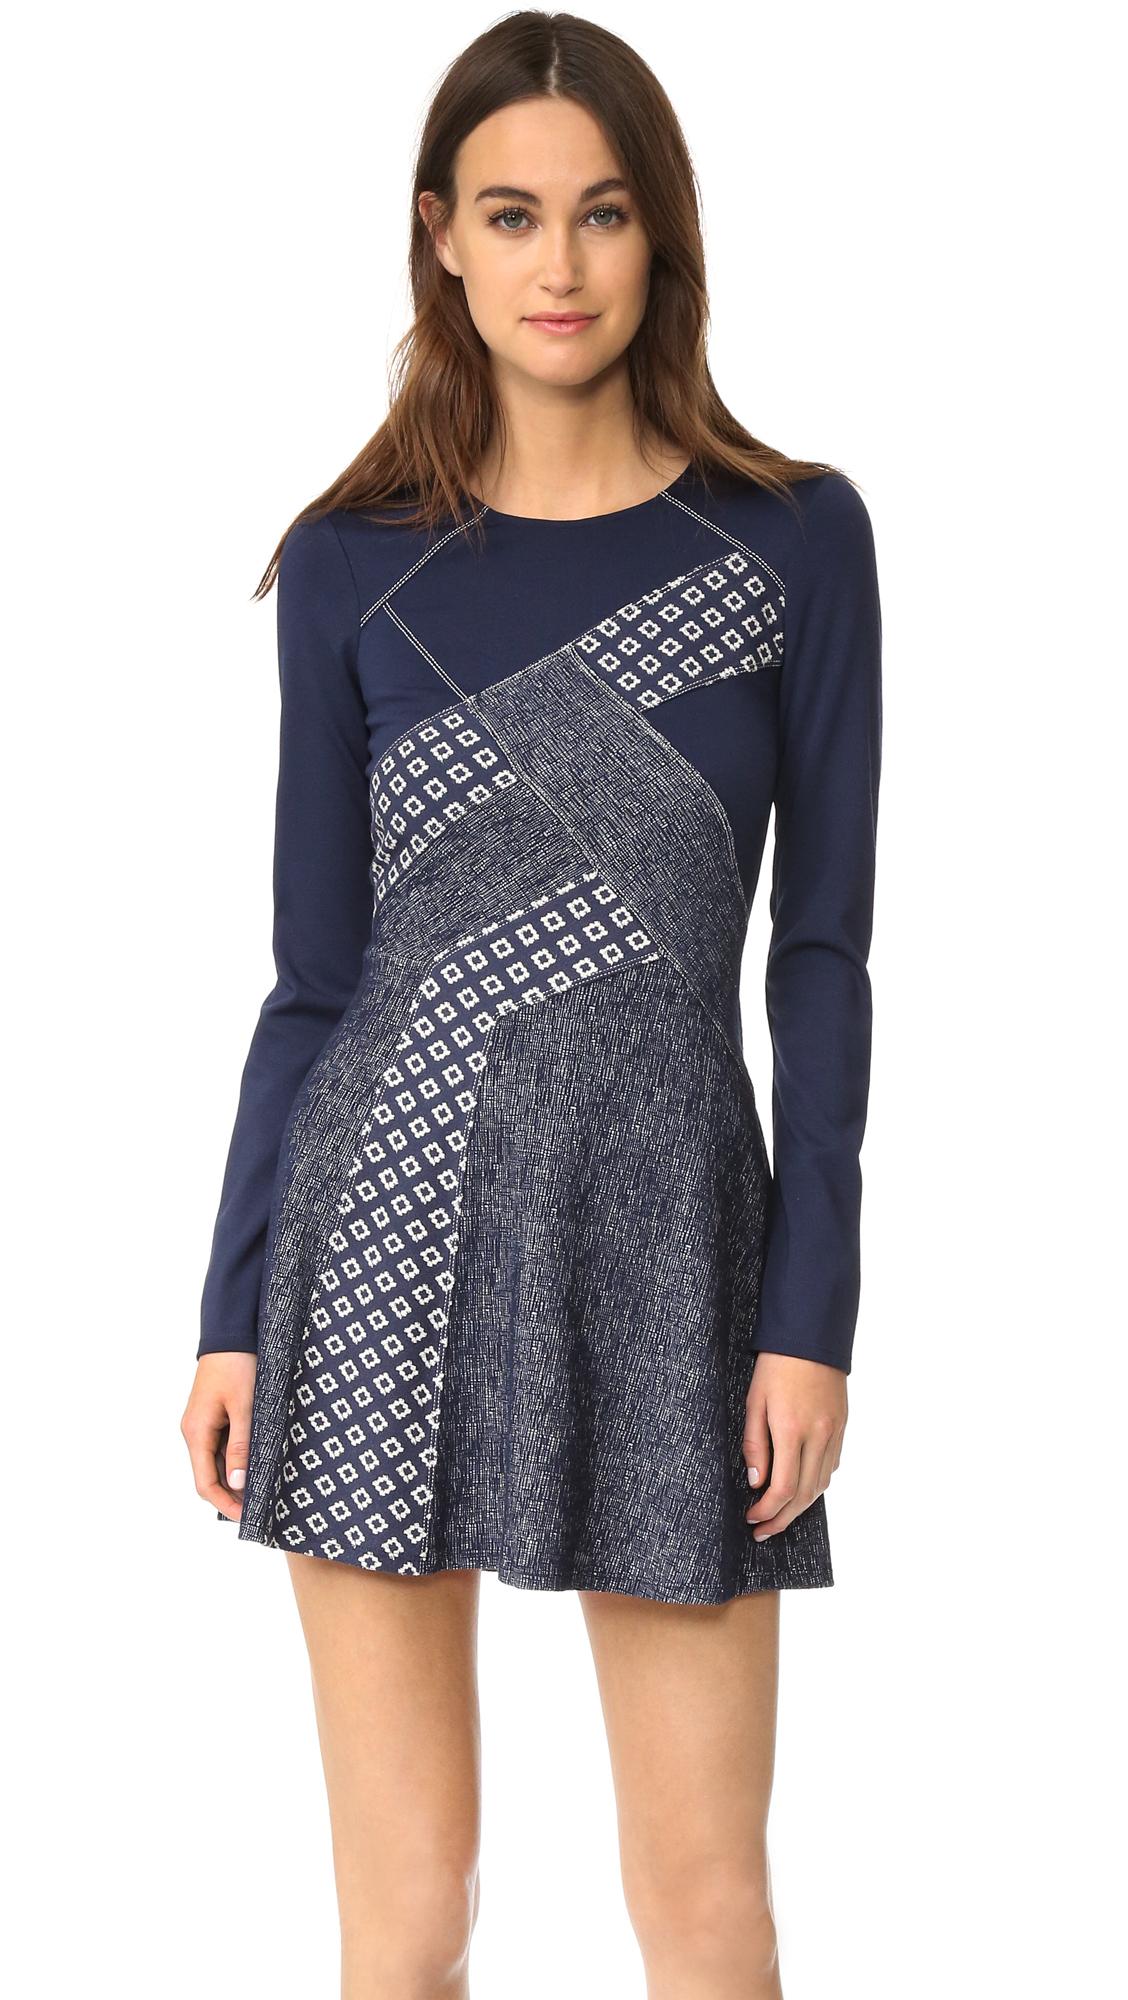 Bcbgmaxazria Patchwork Dress - Dark Navy Combo at Shopbop